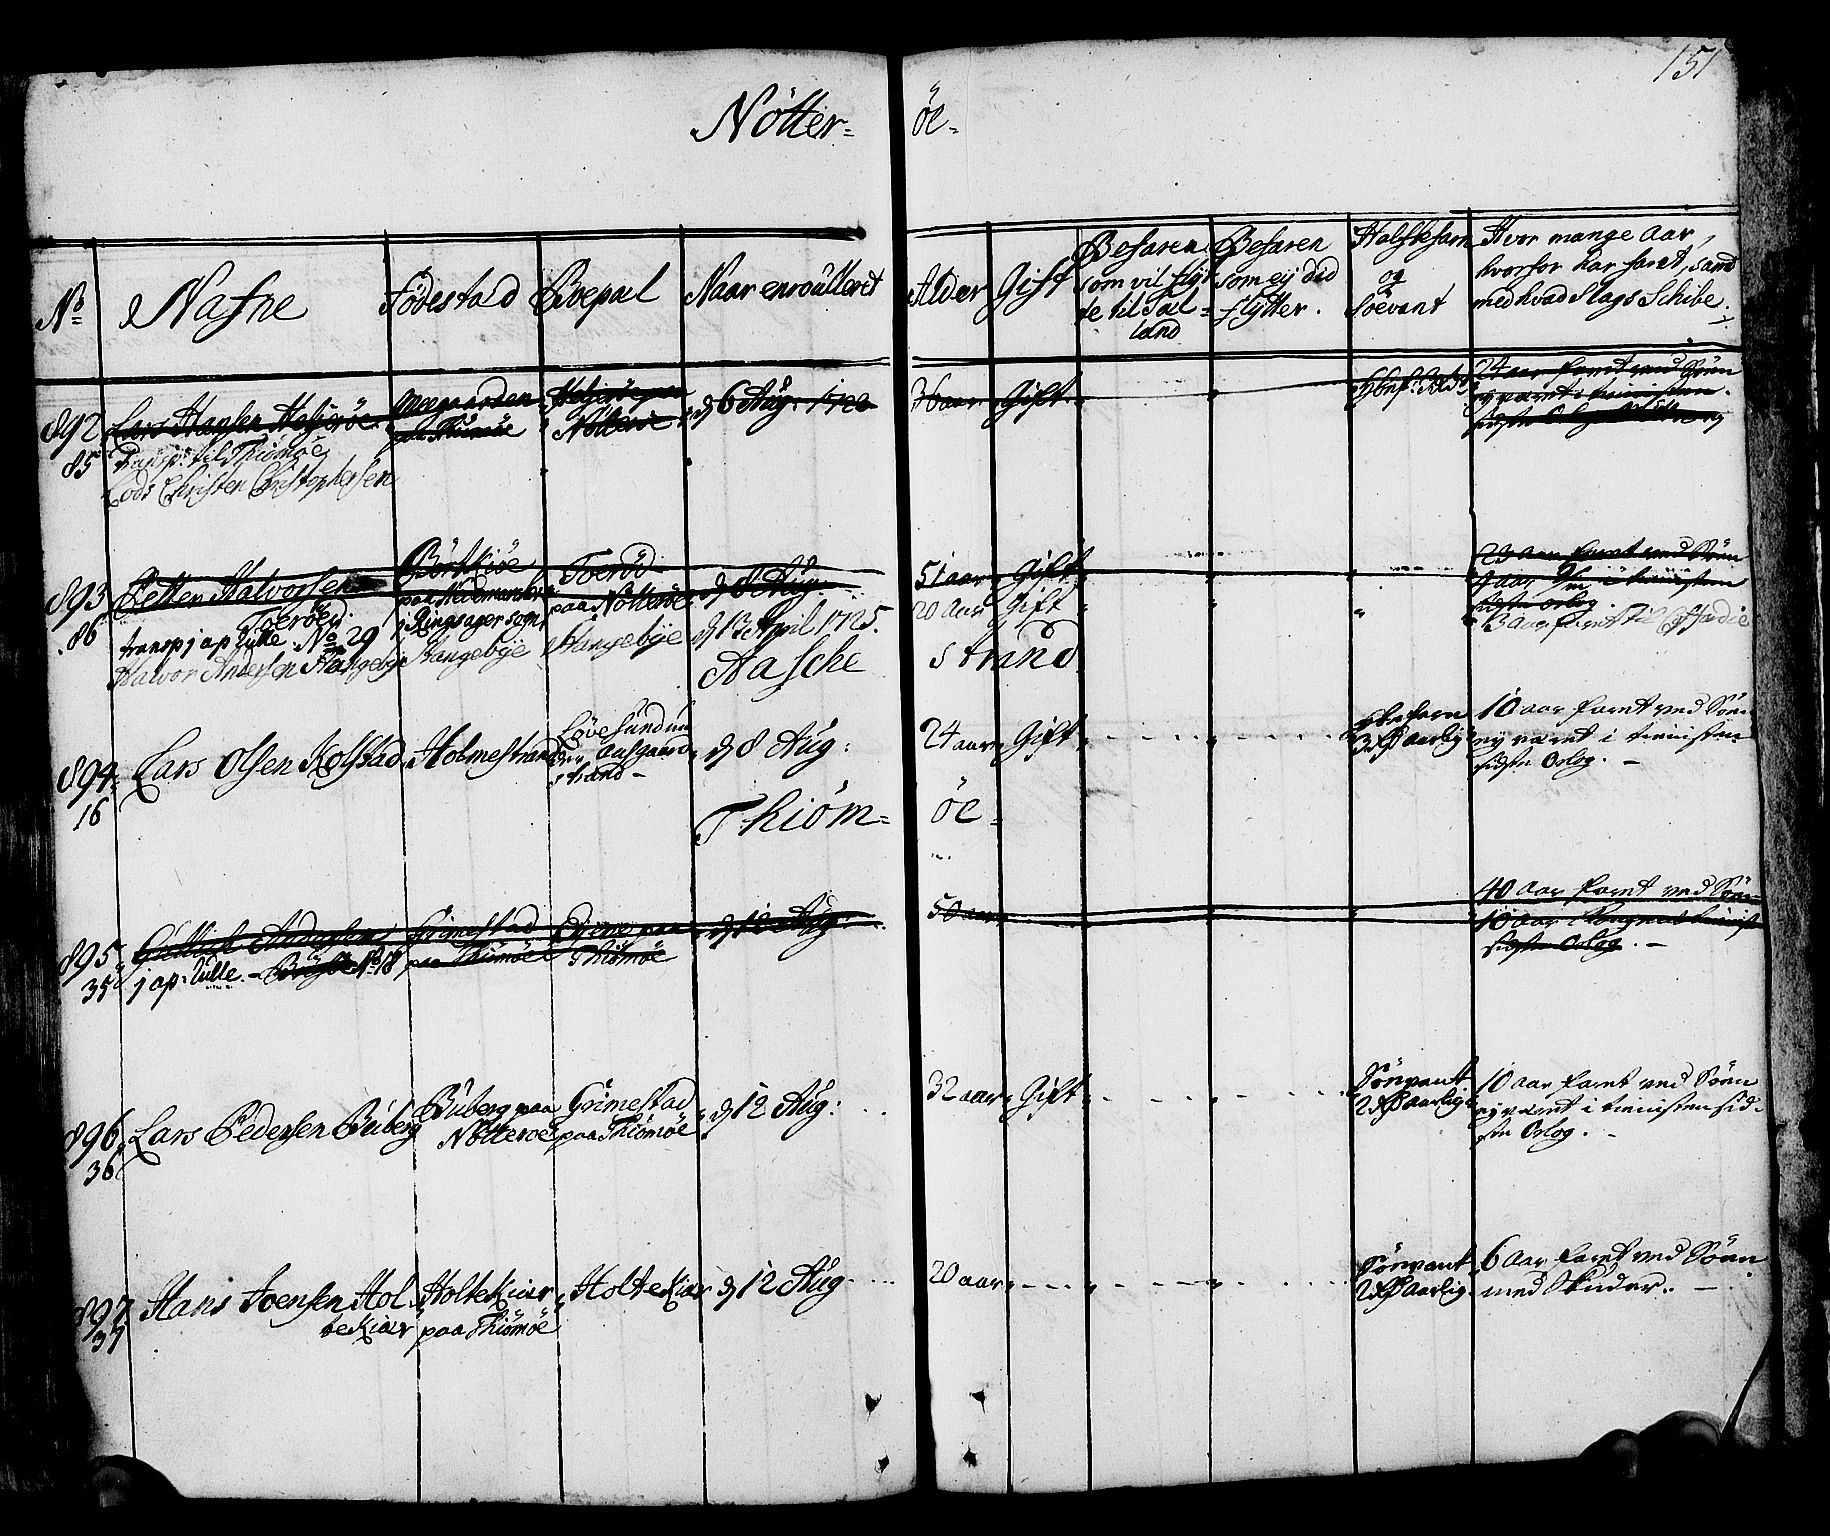 SAKO, Drammen innrulleringsdistrikt, F/Fa/L0002: Hovedrulle, 1723-1726, p. 152